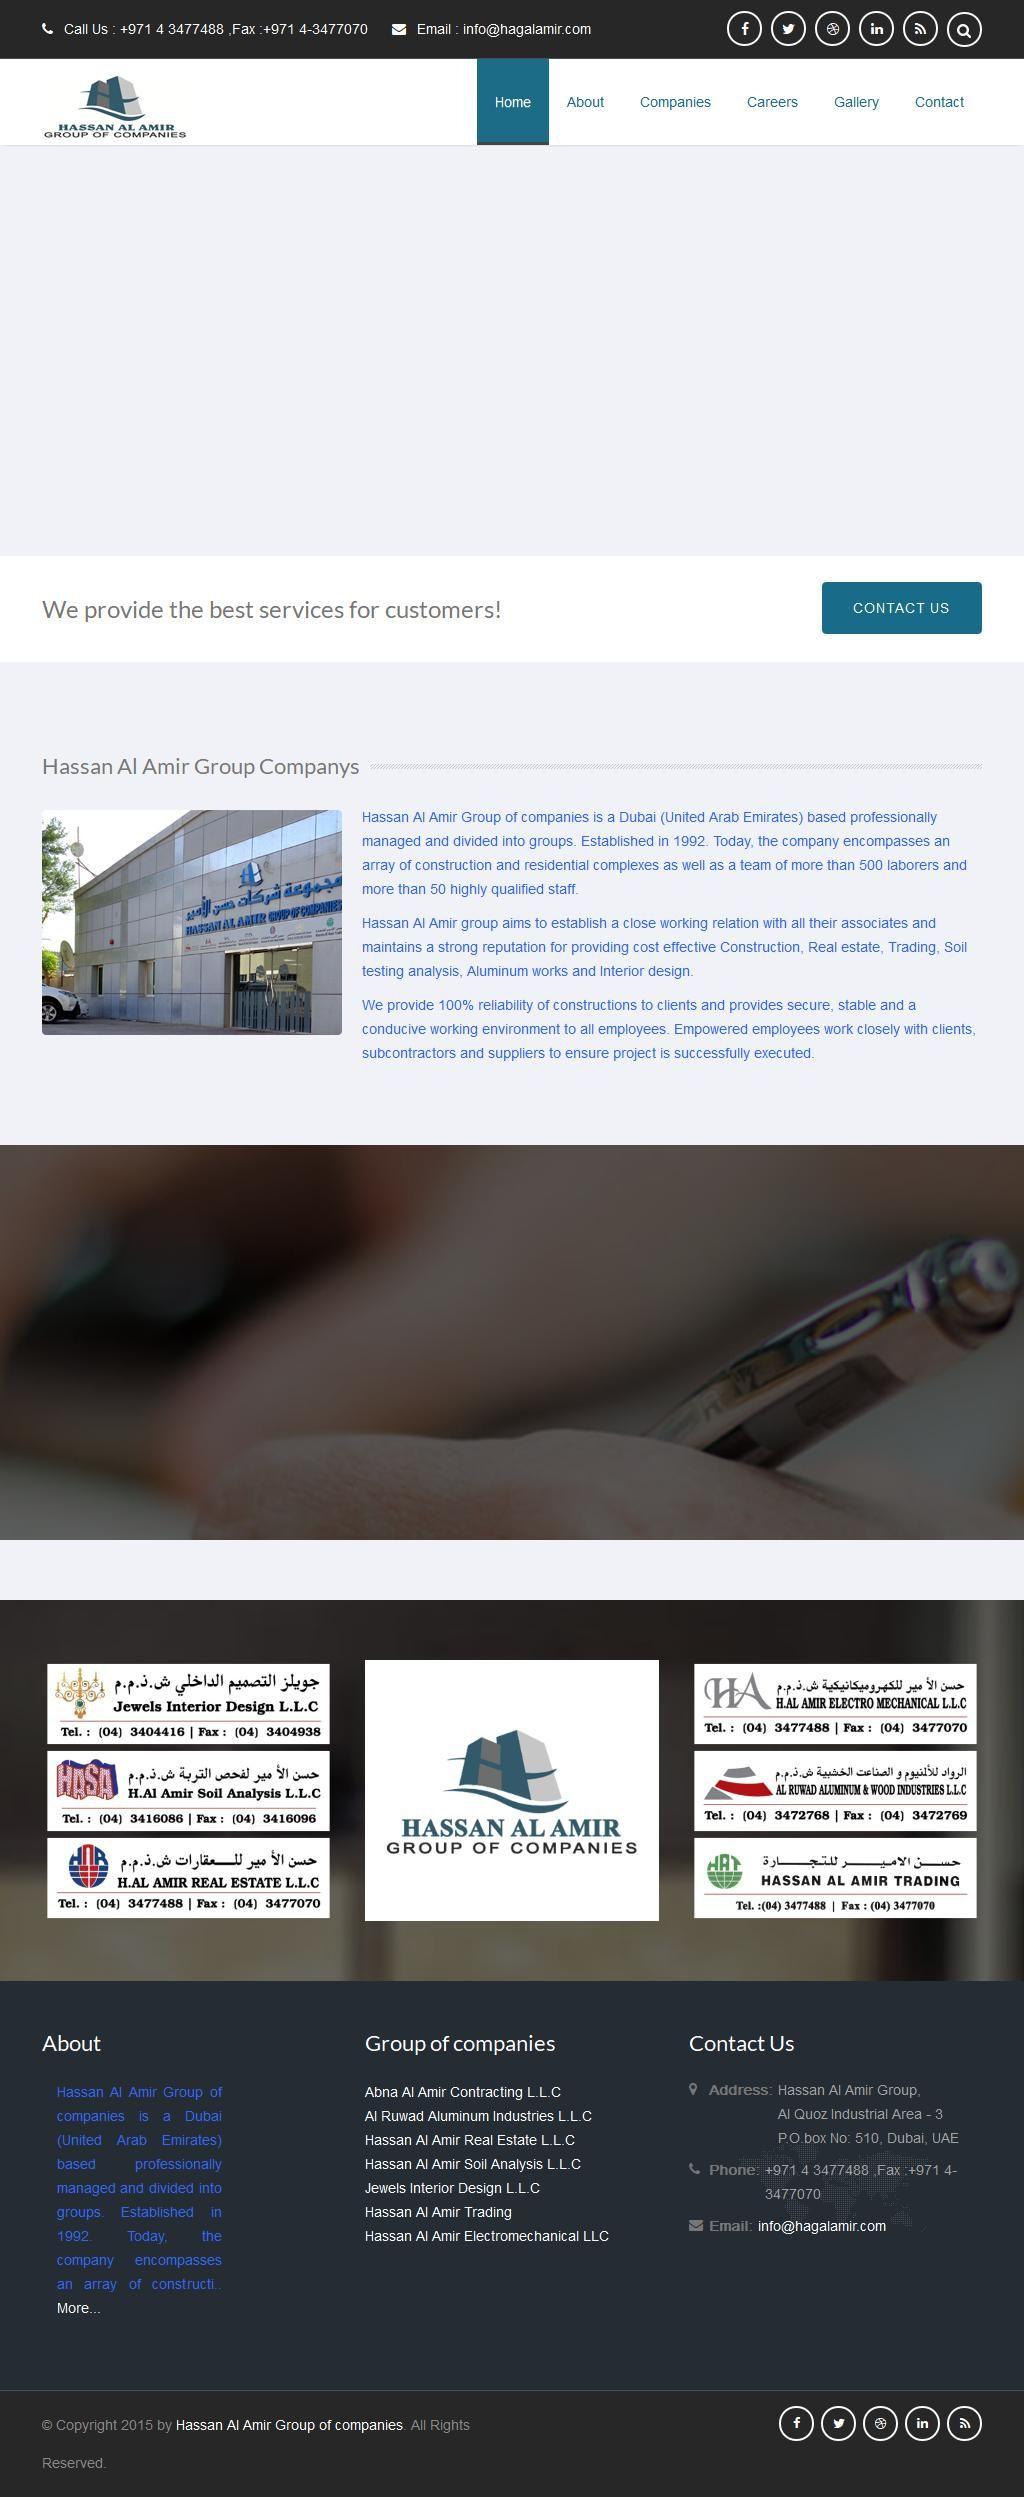 Sharjah Industrial Area Companies